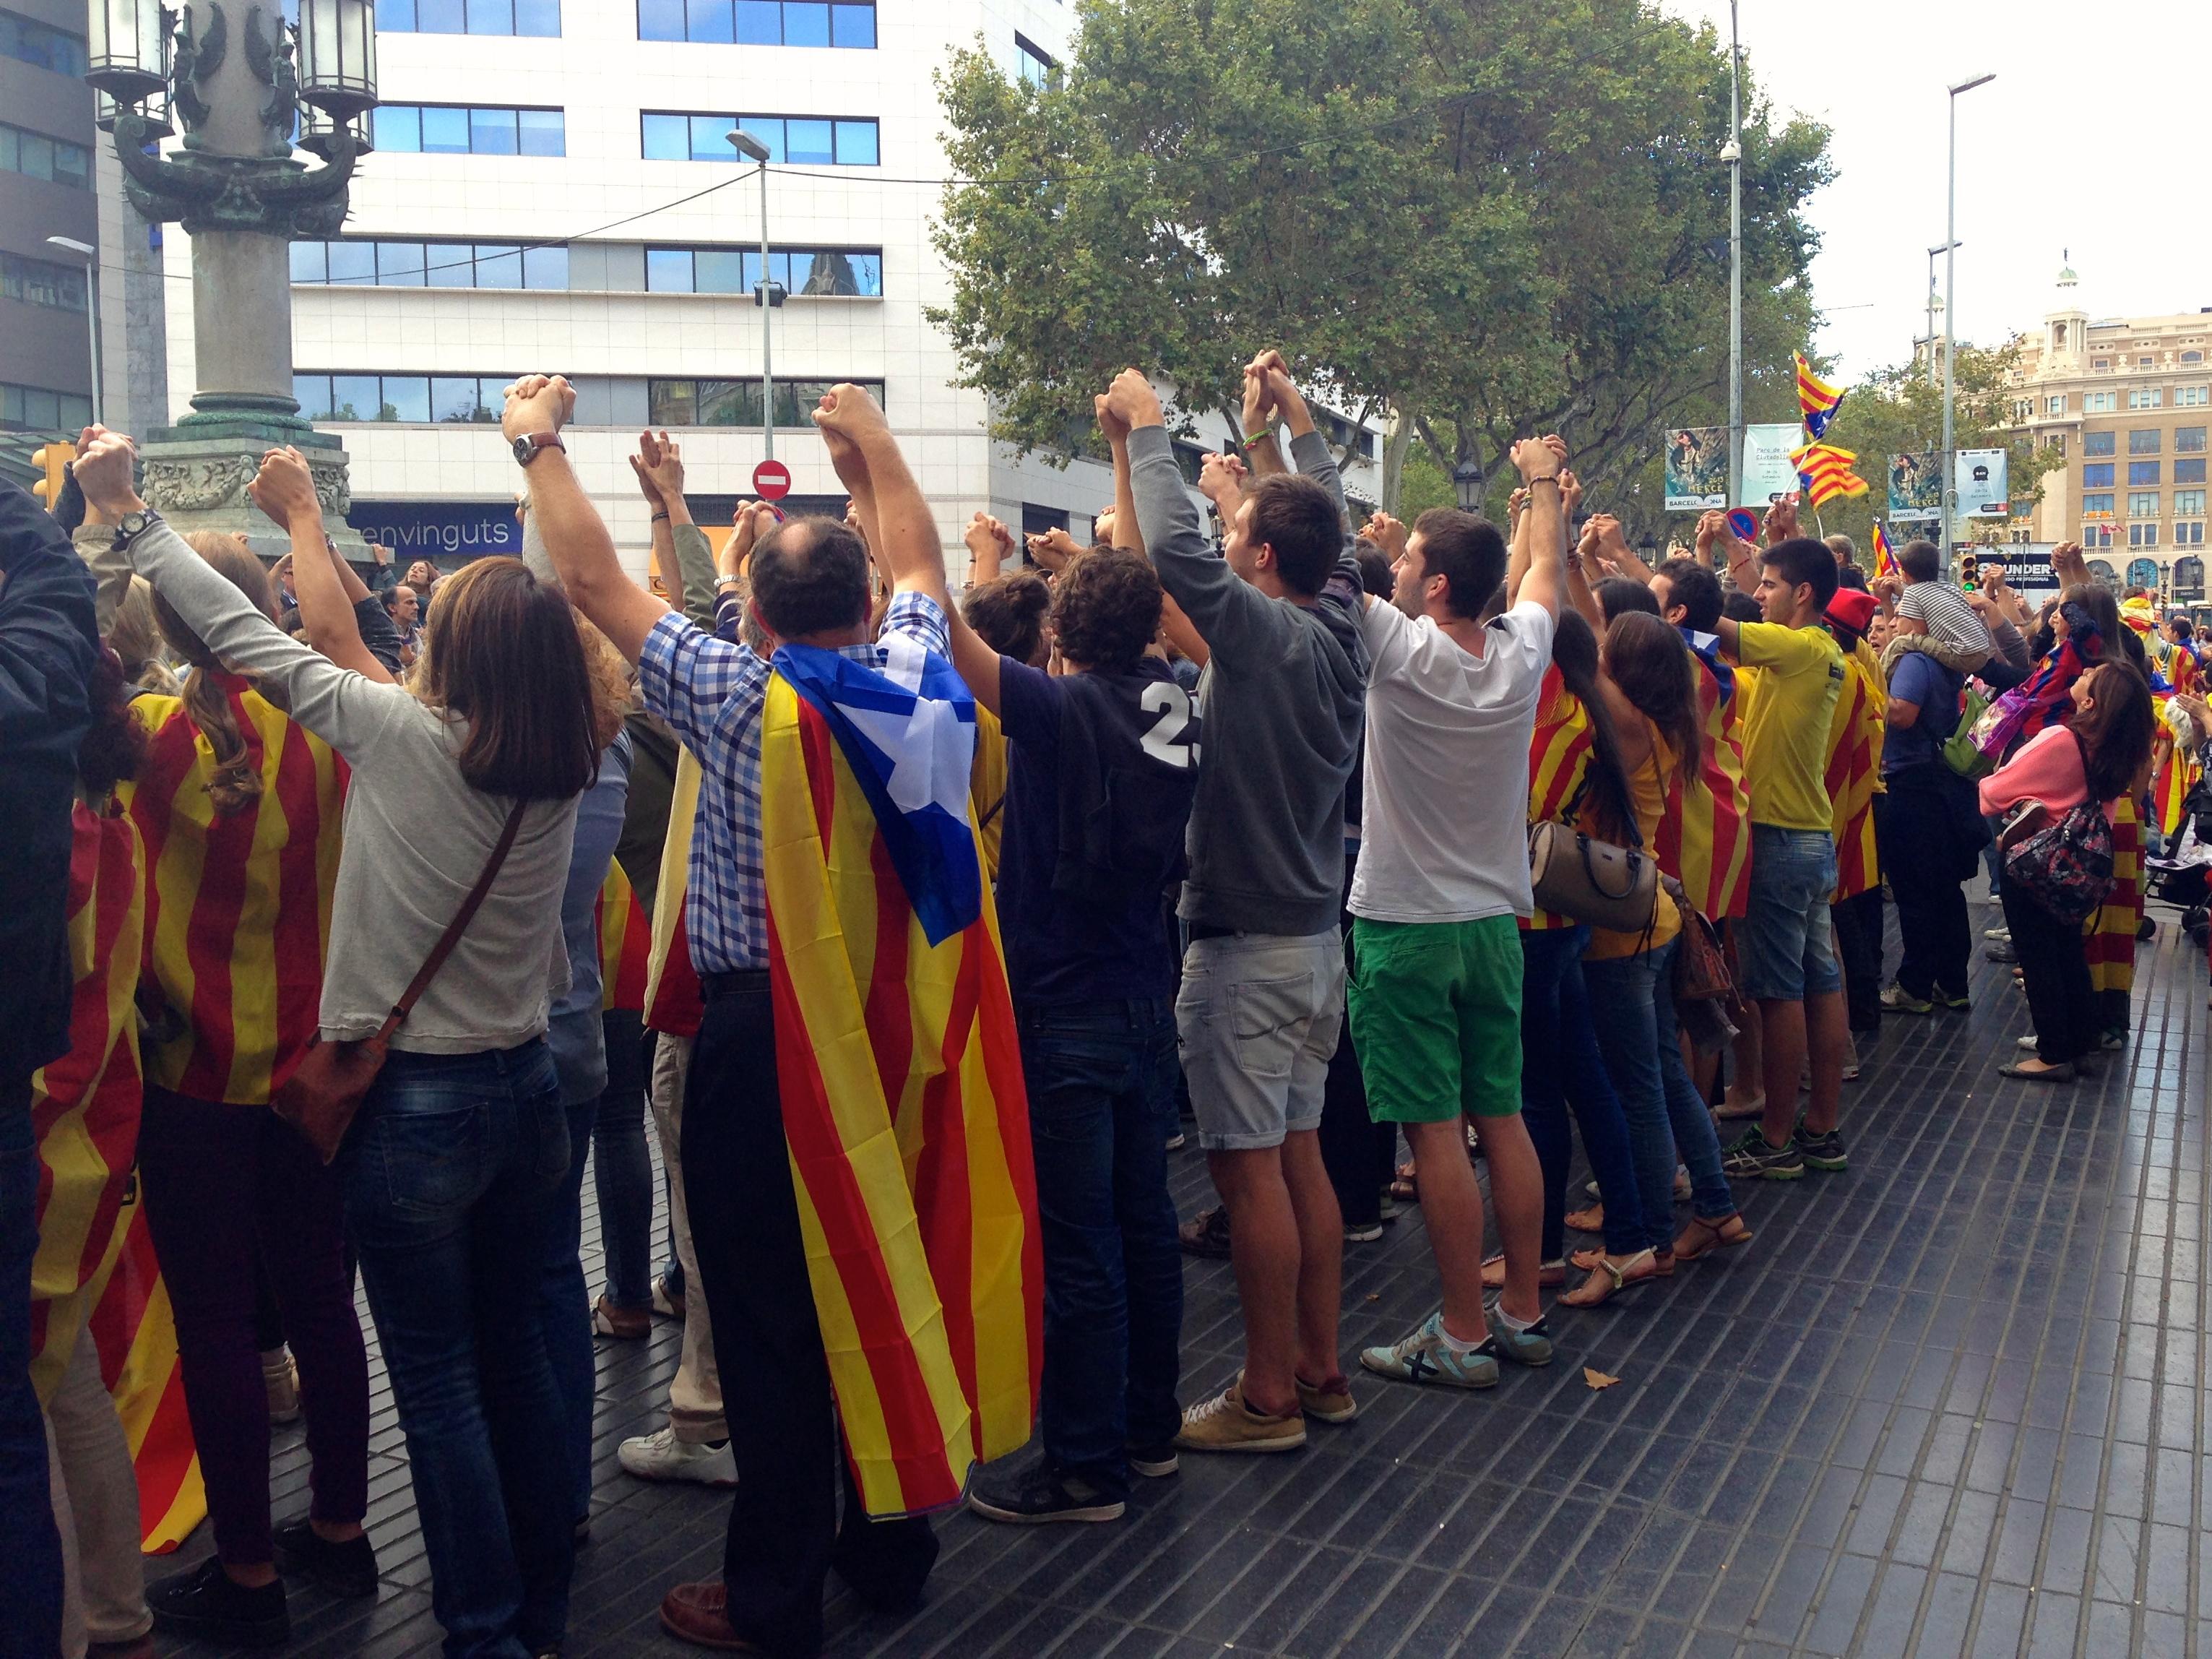 Plaça Catalunya, Barcelone | © Valentin Berthoux/Le Journal International